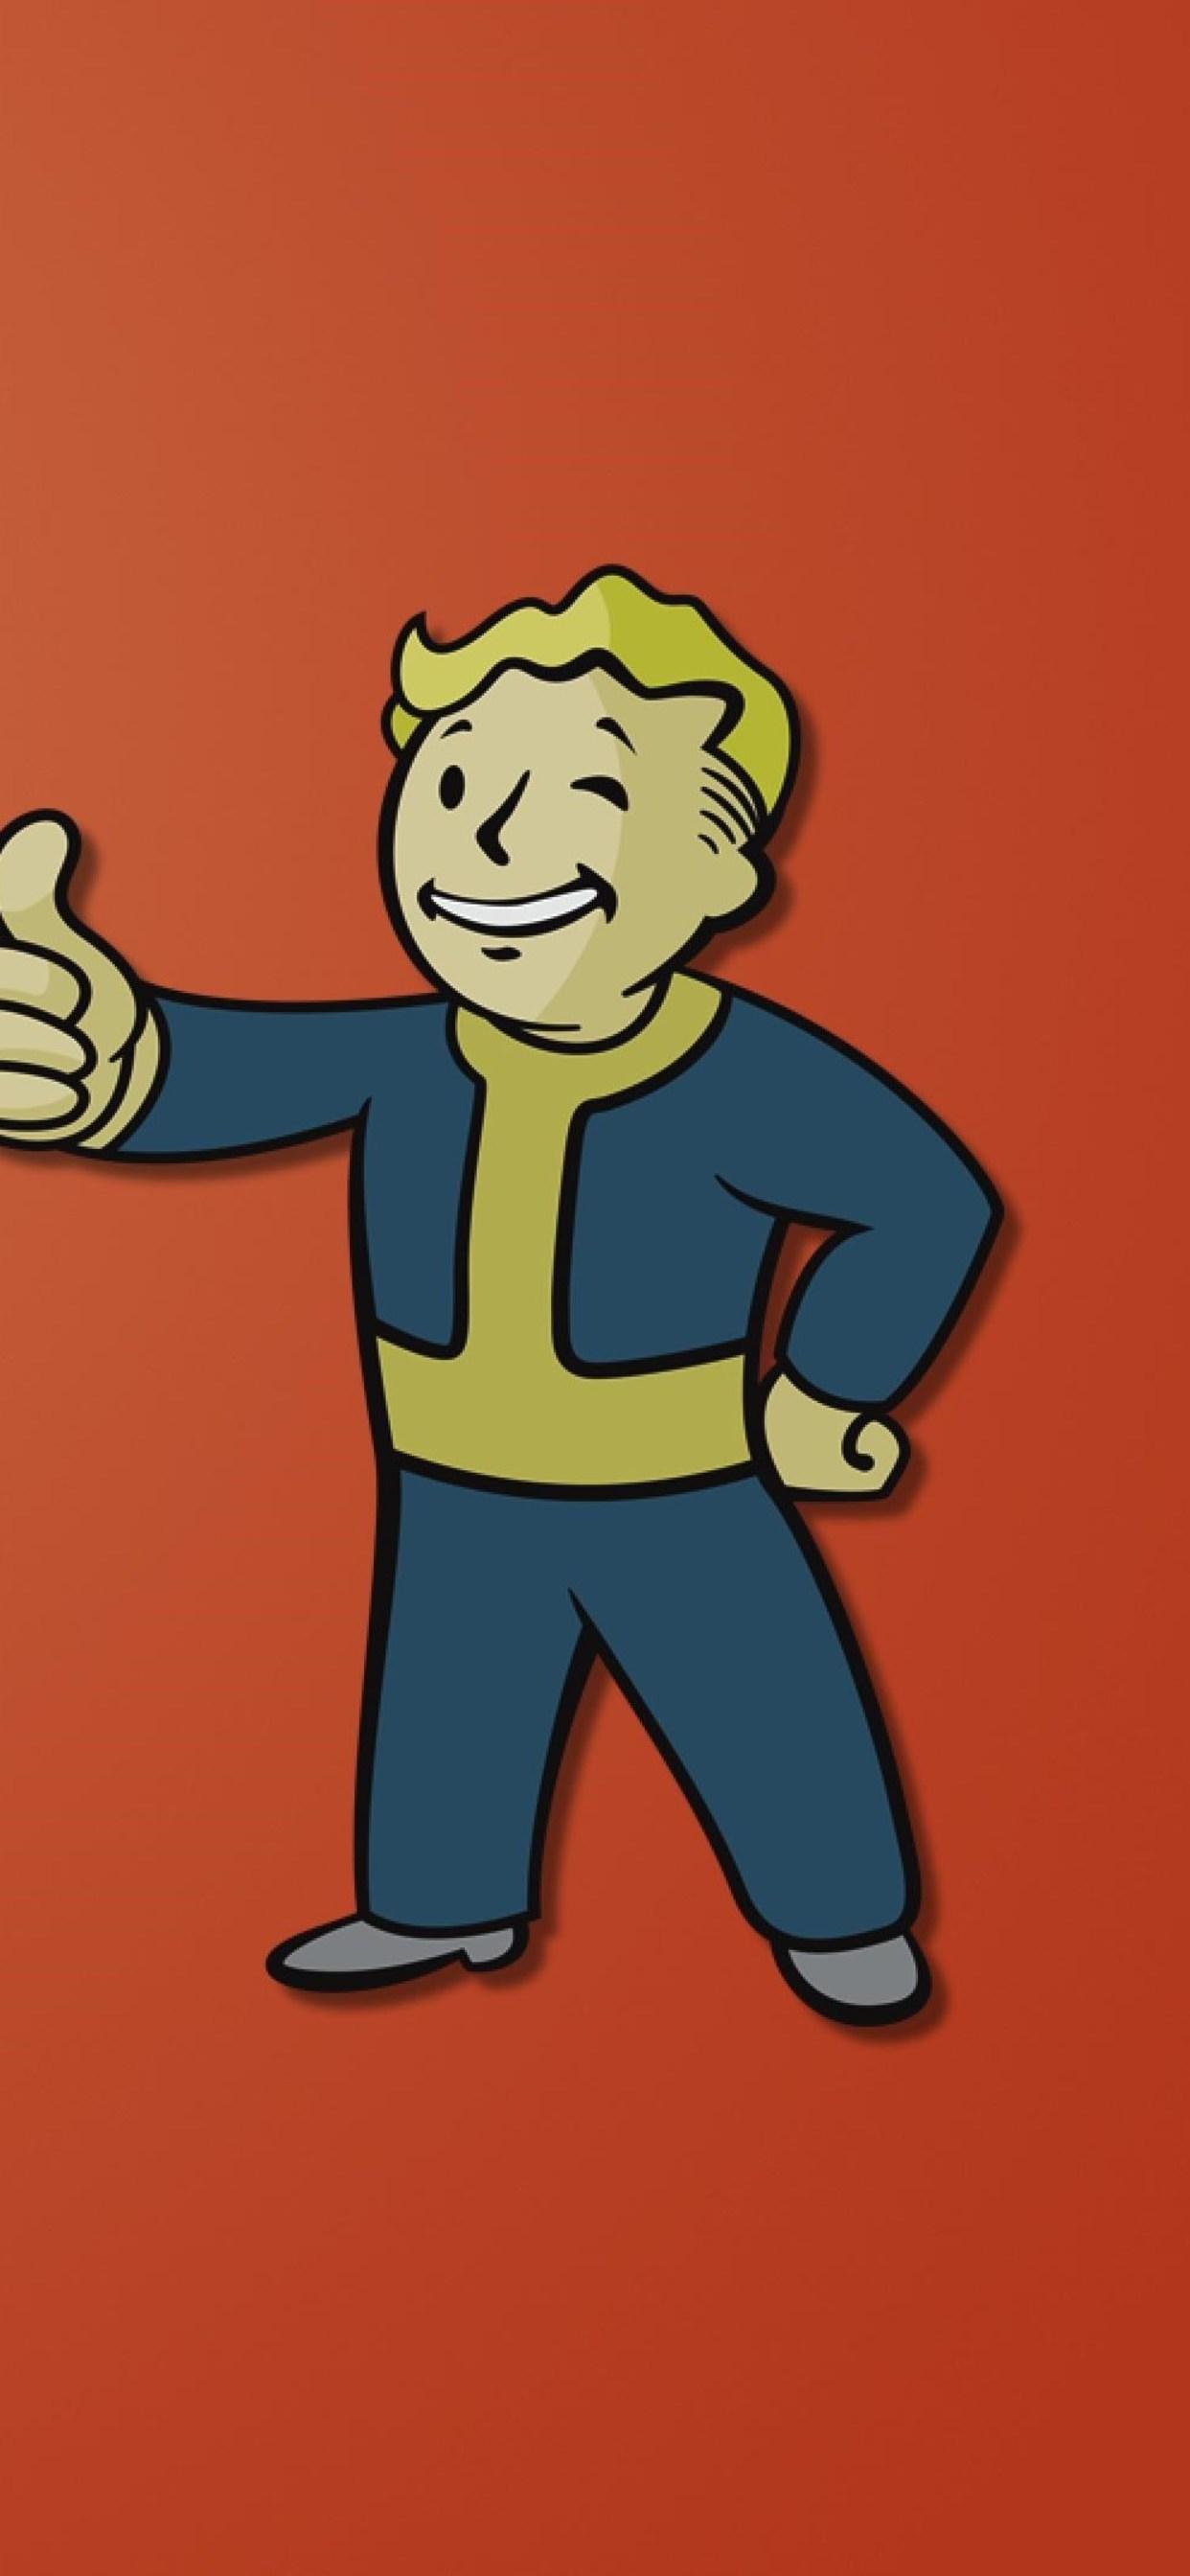 Fallout Boy Minimalism - Fallout 4 Steam Grid , HD Wallpaper & Backgrounds